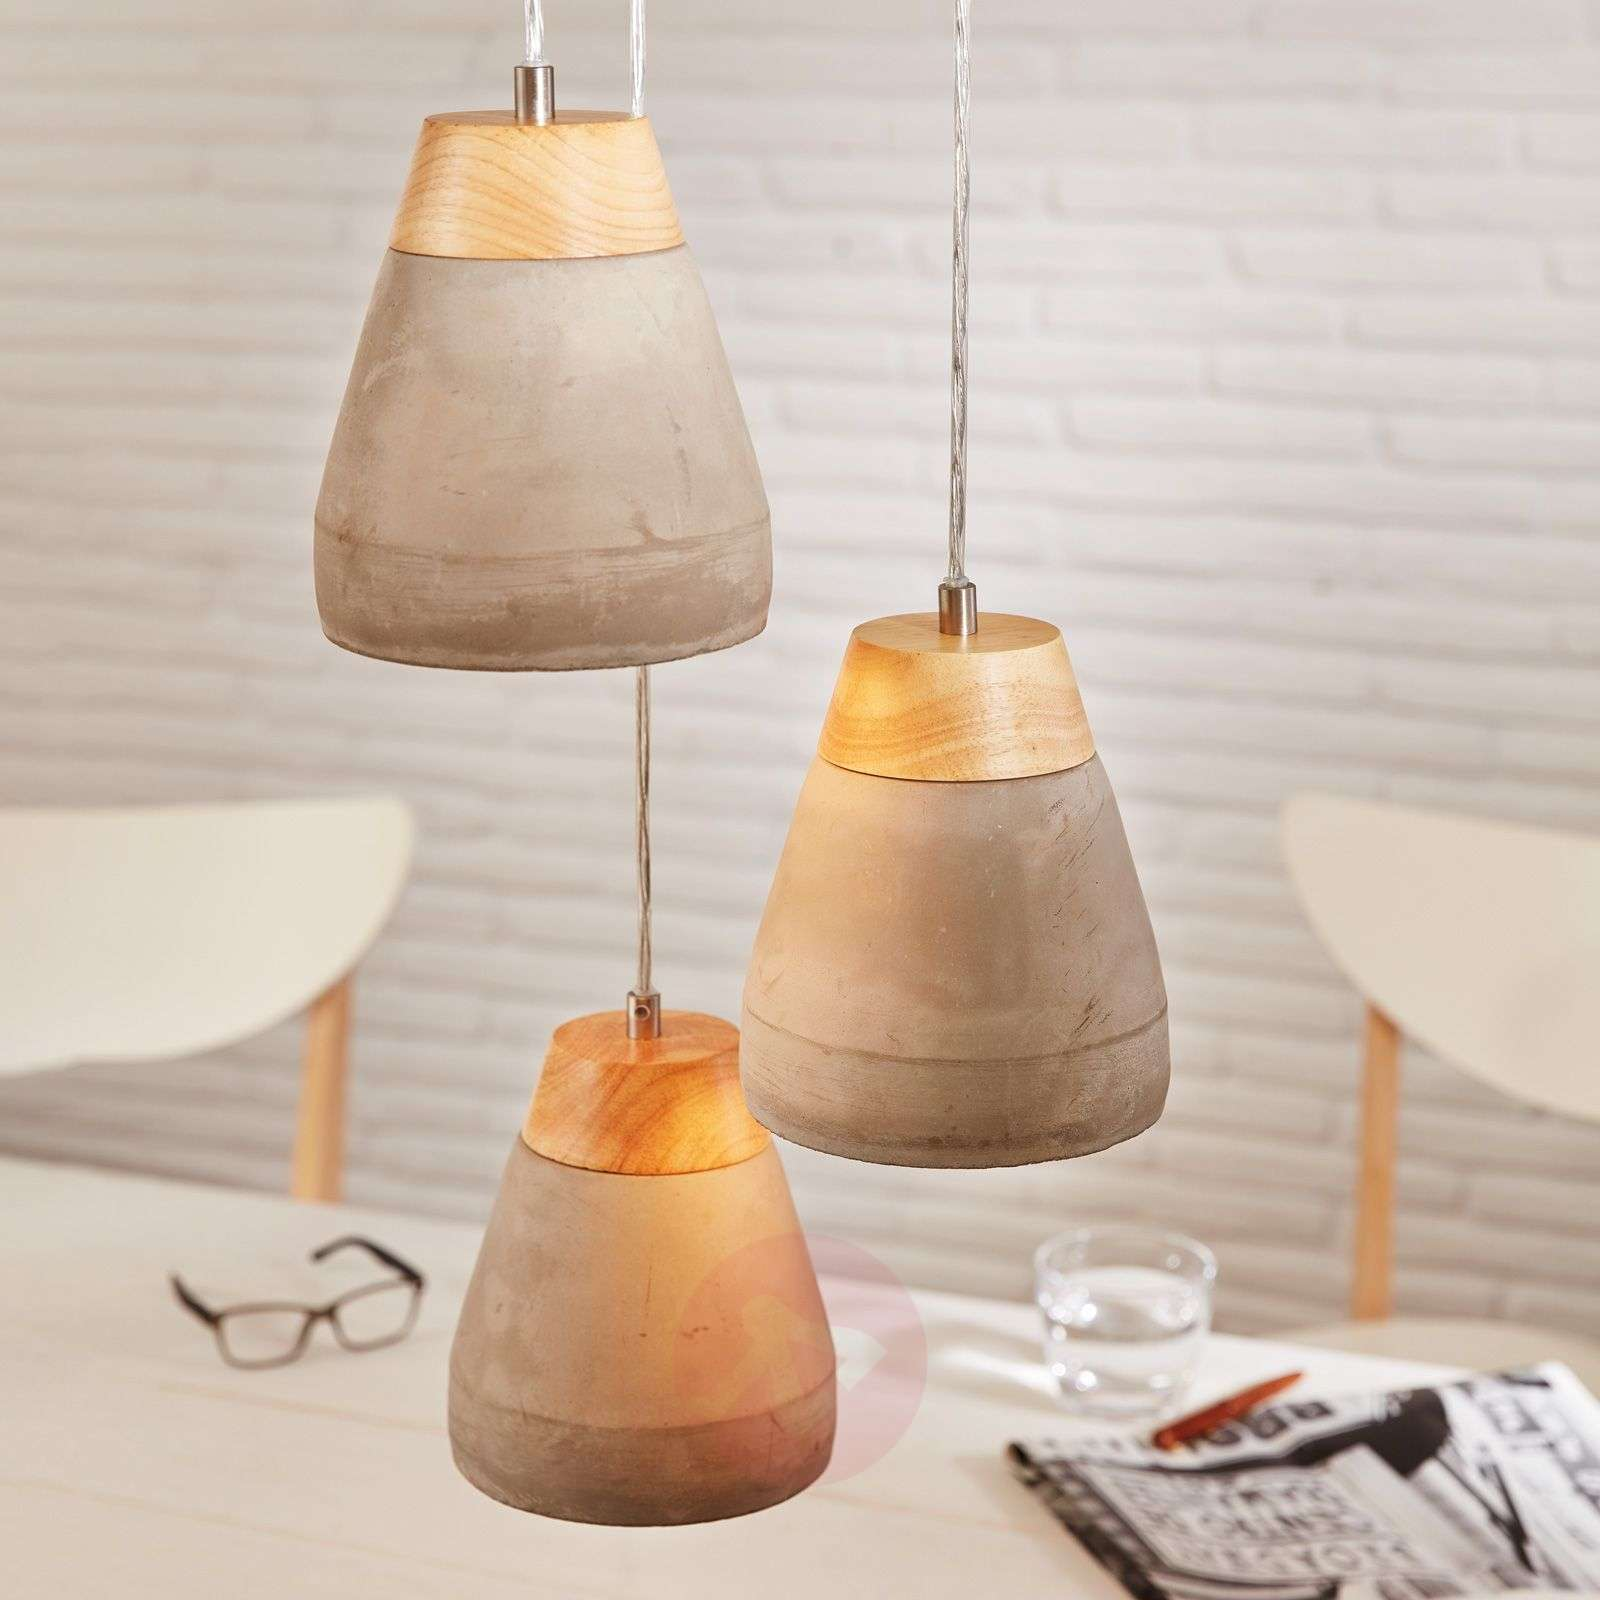 Puristic Tarega hanging light with concrete look-3031930-04